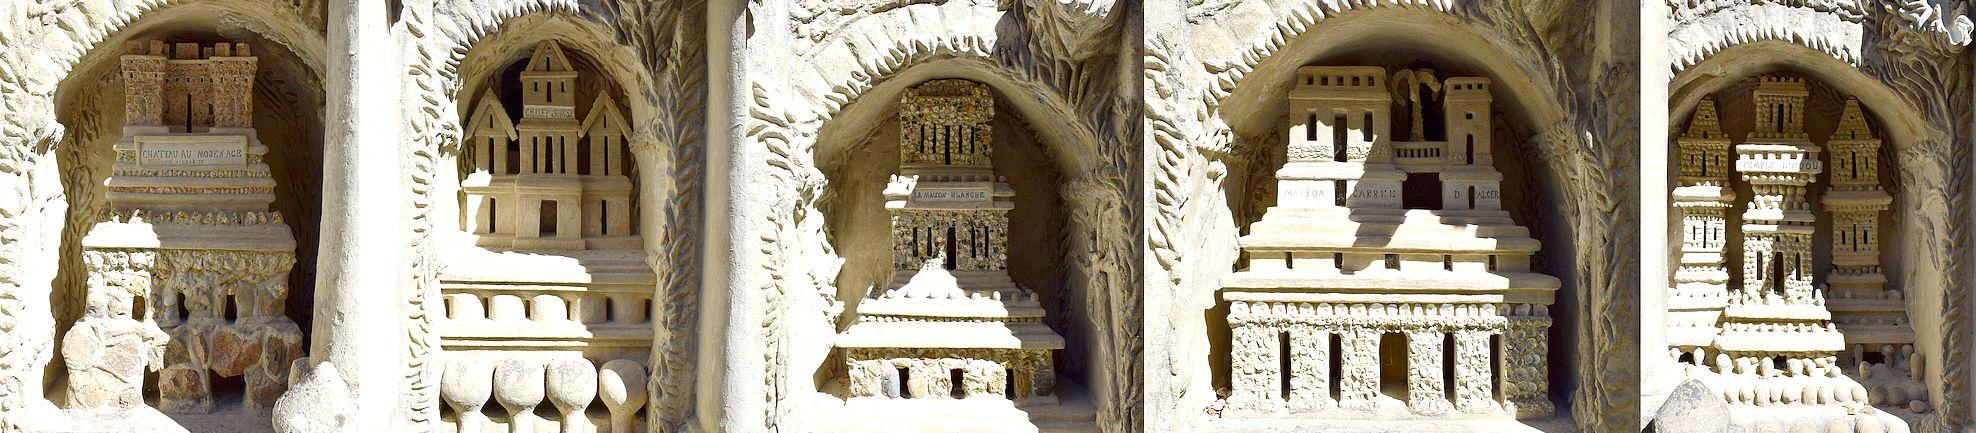 temples palais ideal